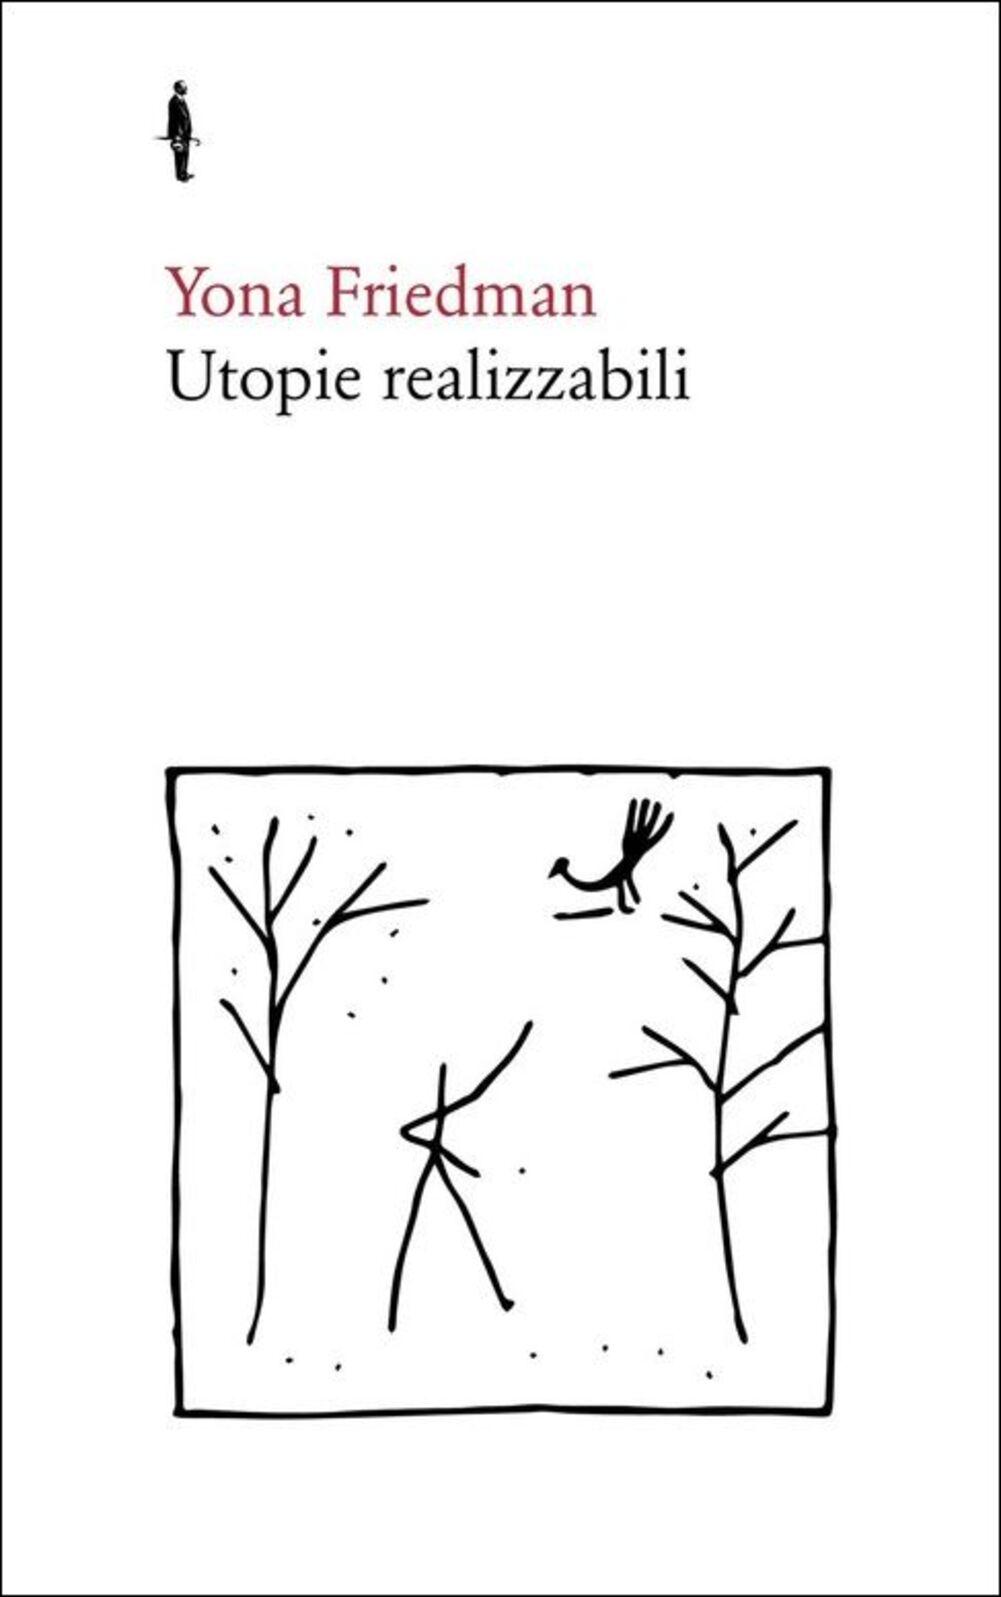 Utopie realizzabili